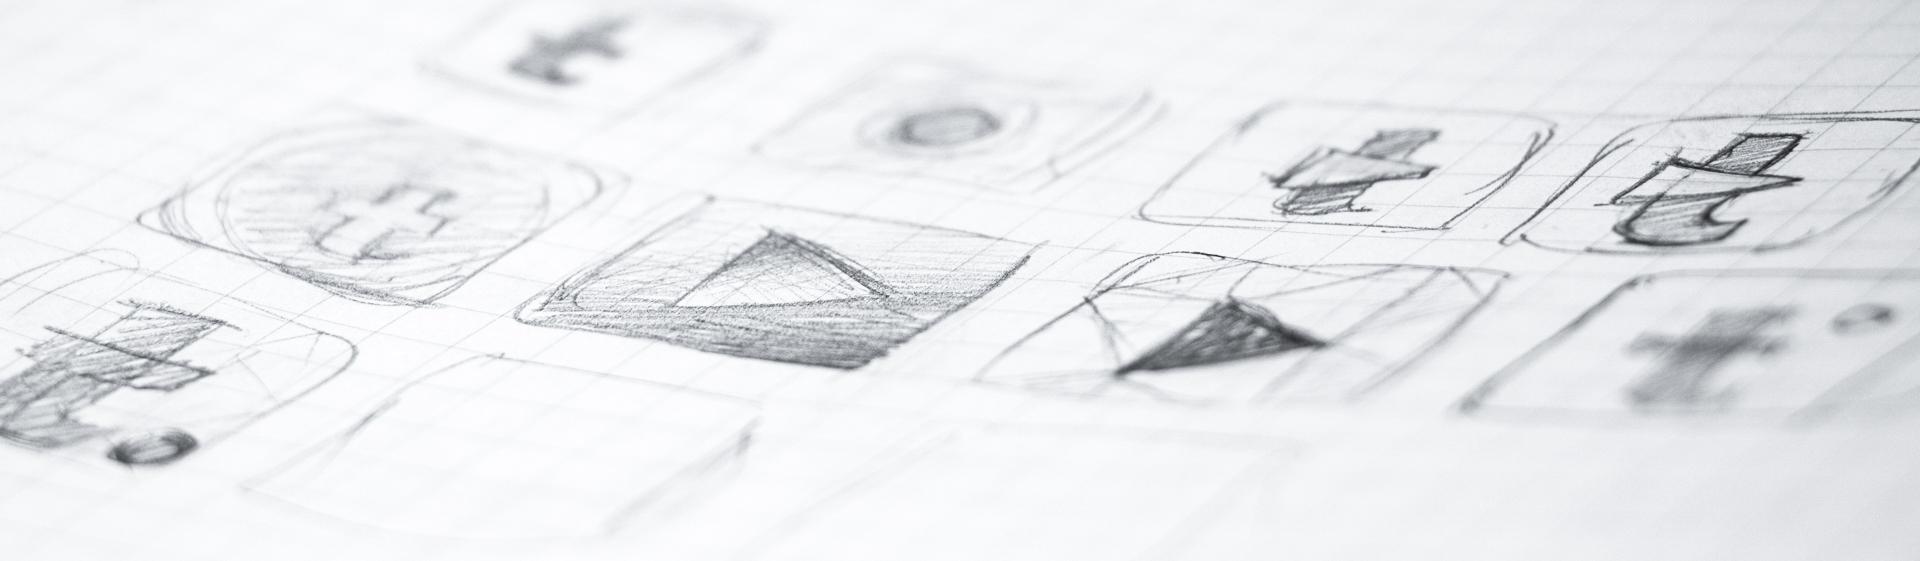 tape-logo-sketches